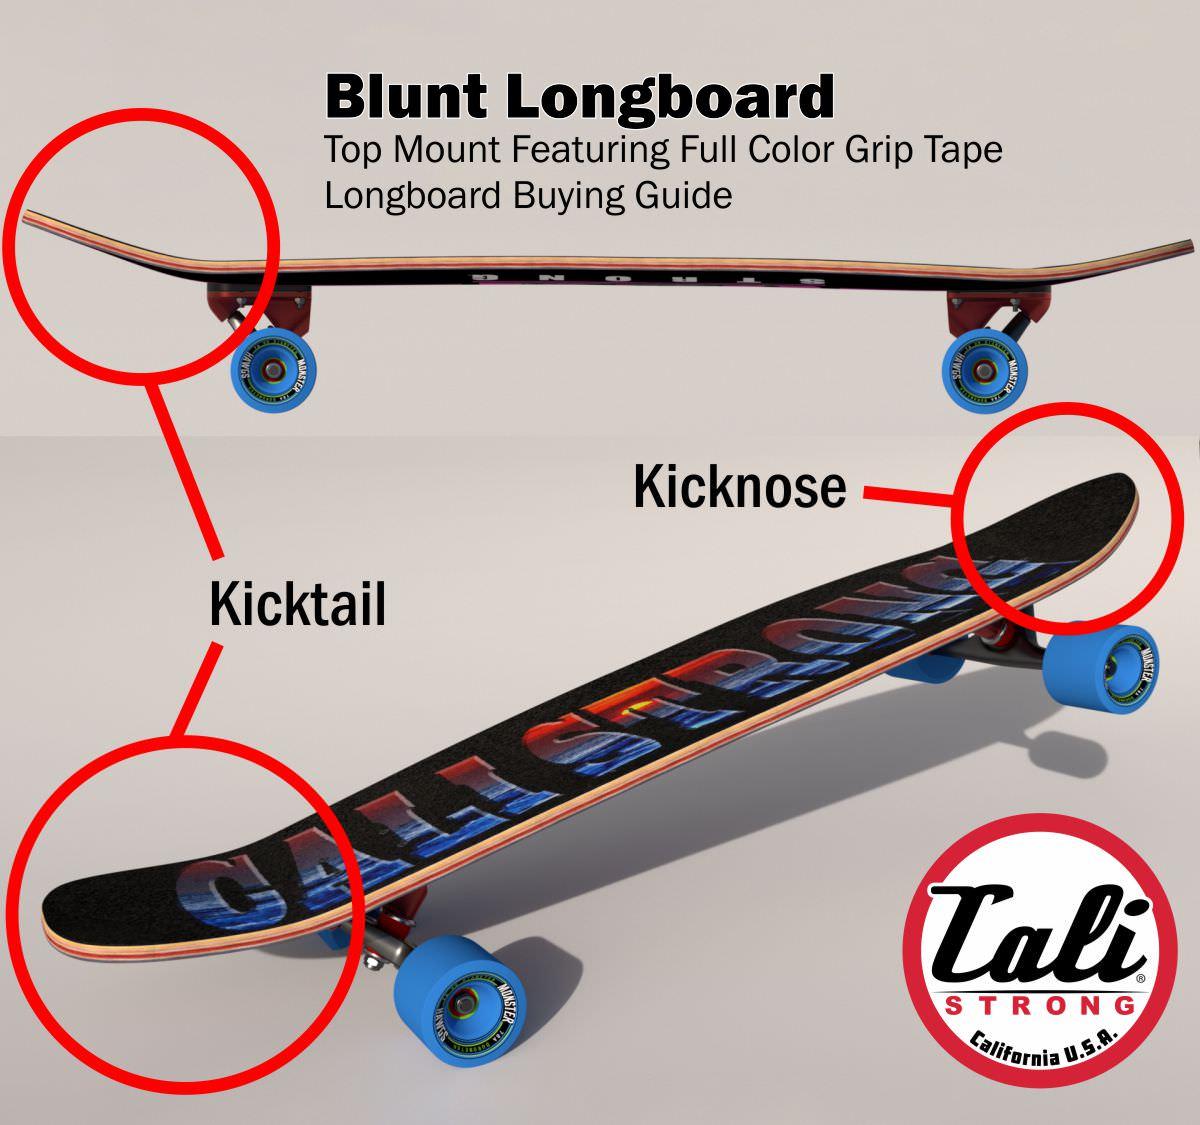 Longboard Kicktail Diagram